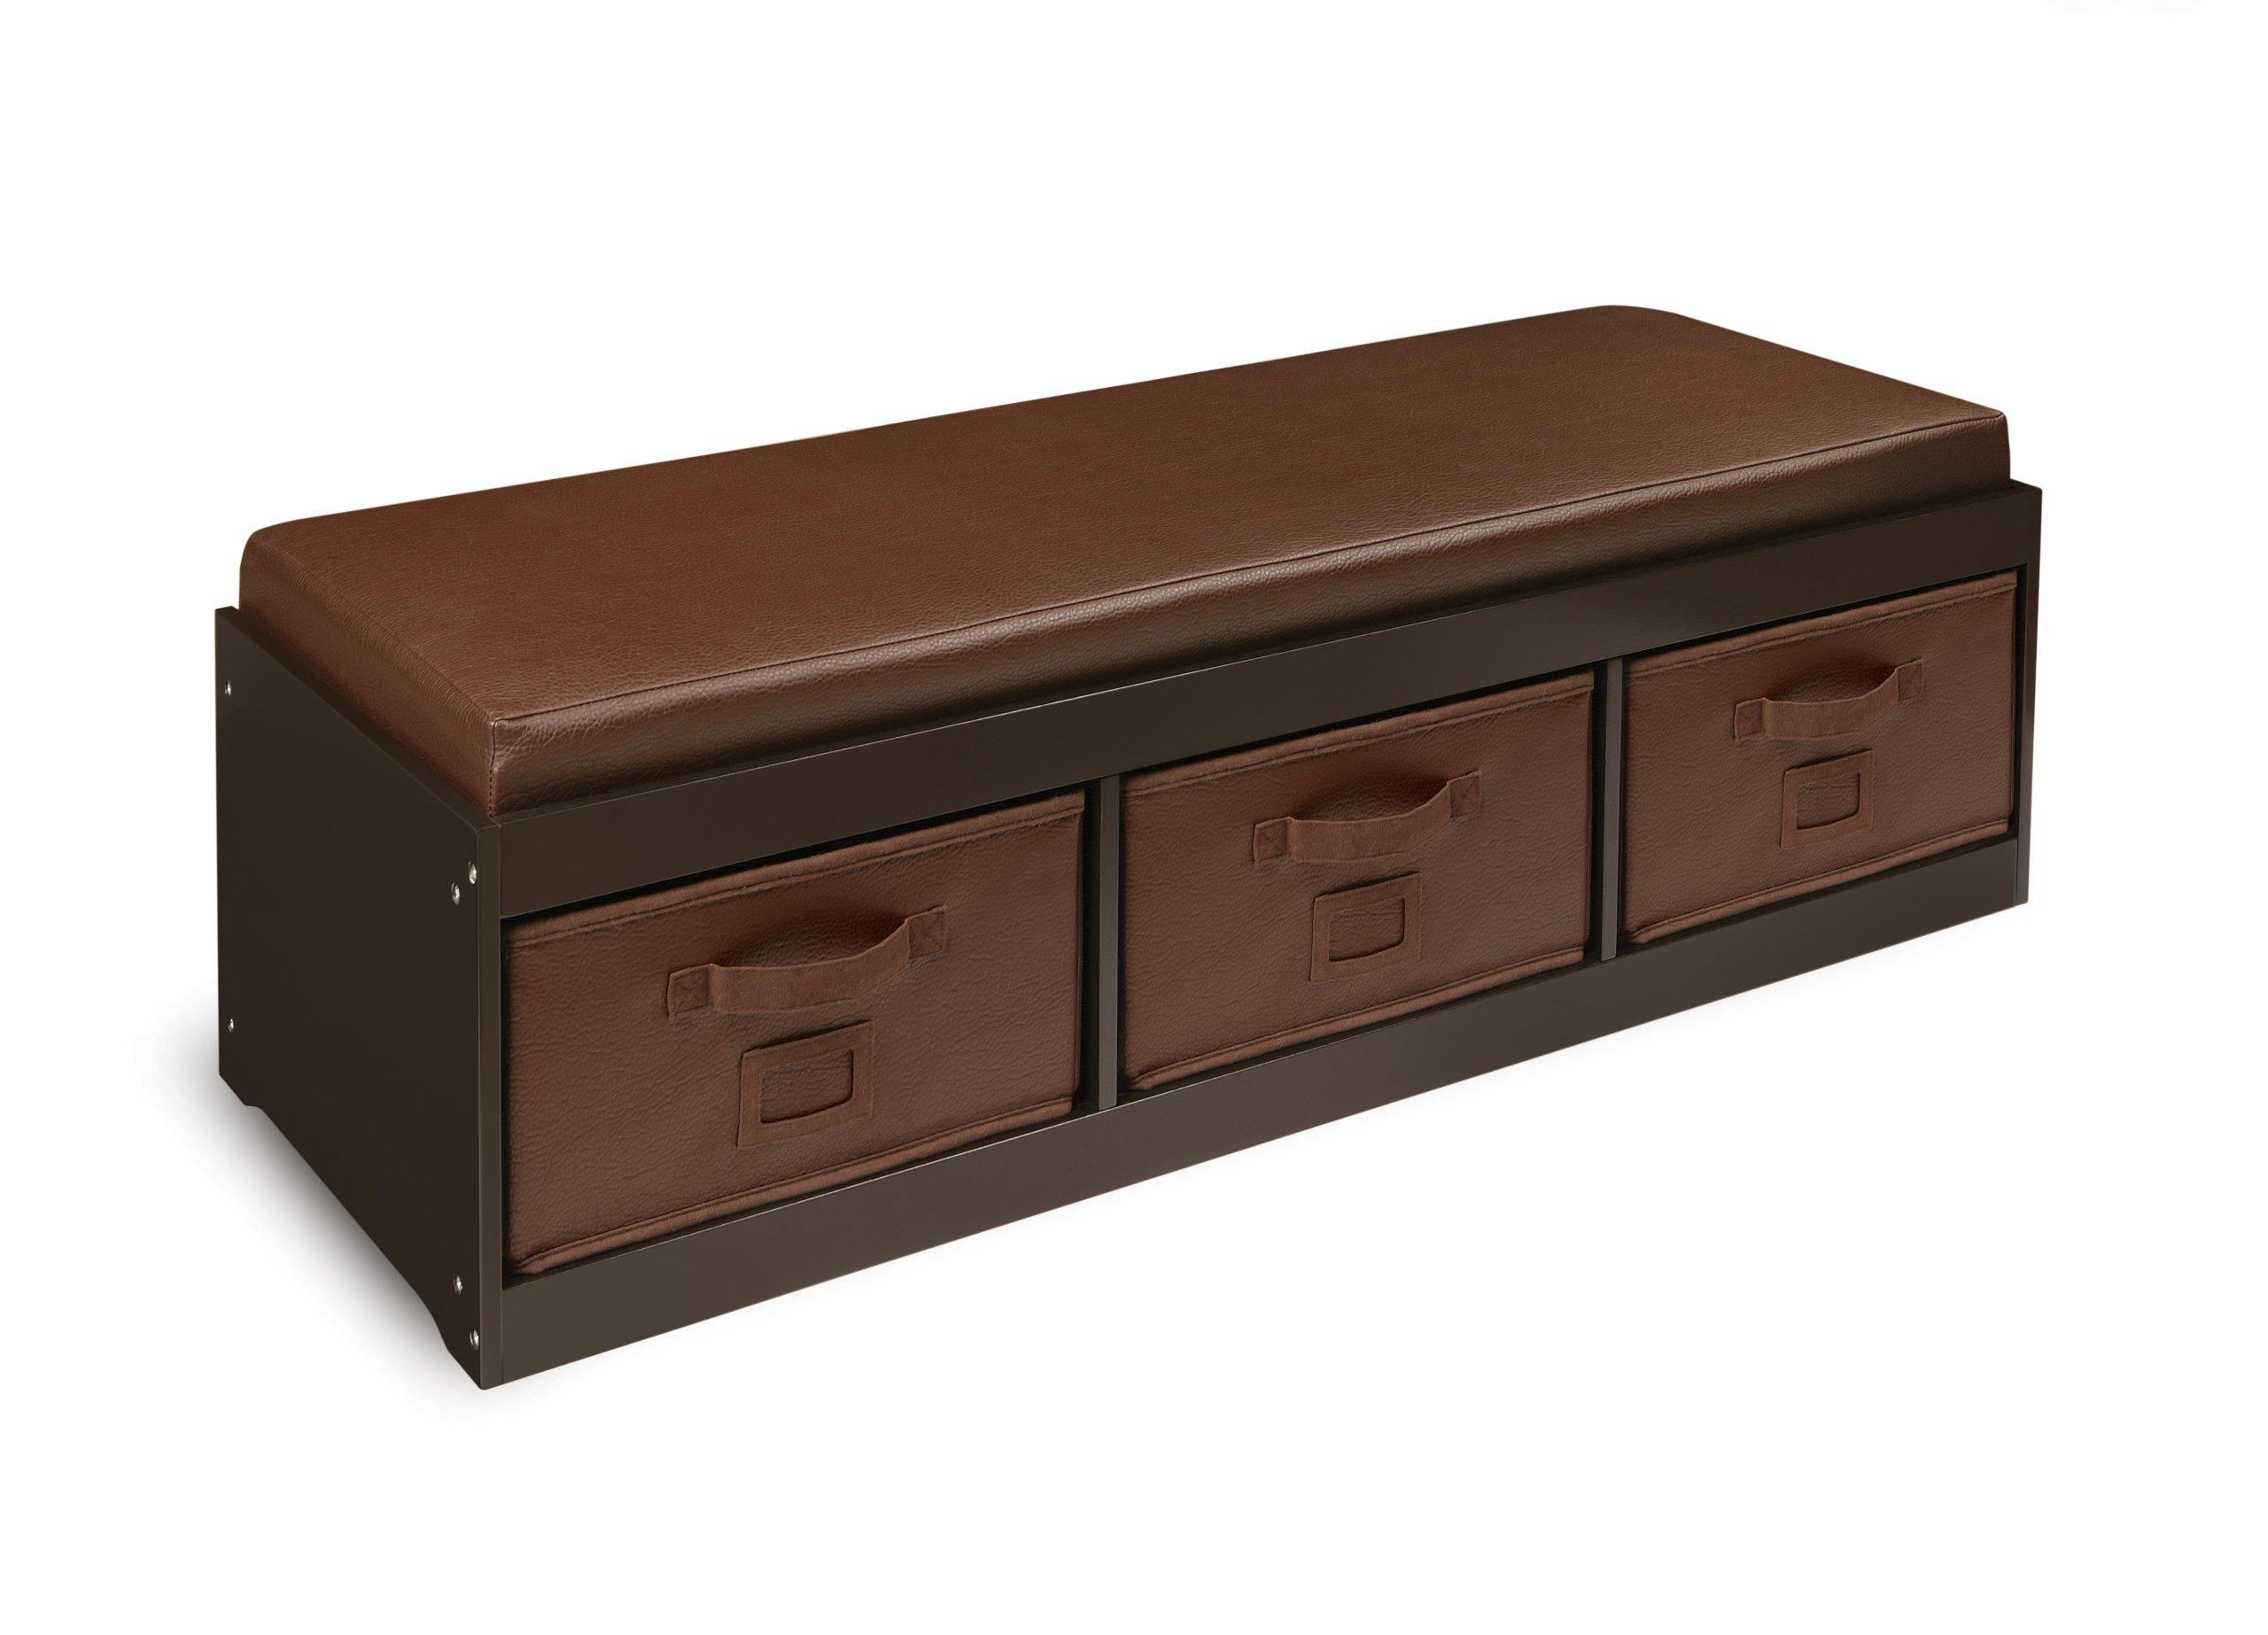 Badger Basket Kid's Storage Bench with Cushion and 3 Bins, Espresso